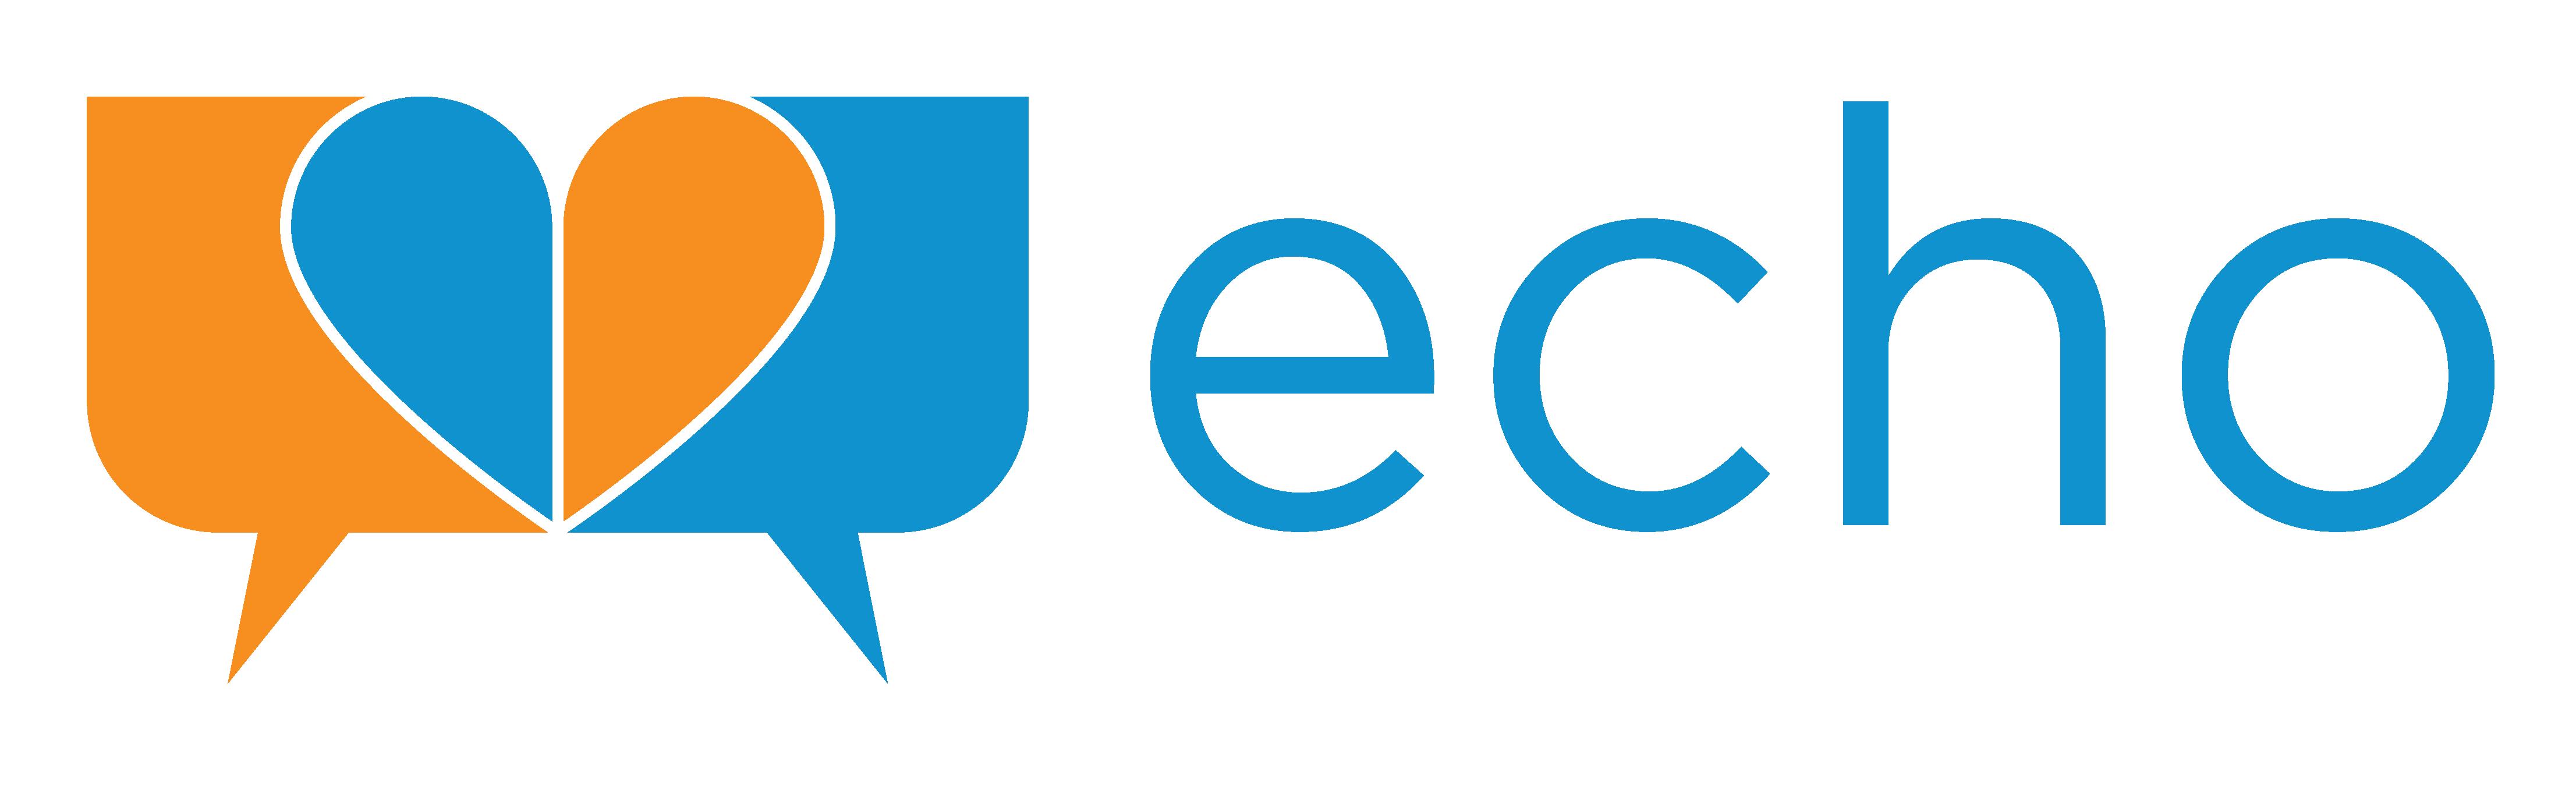 The Impact of Trauma | Echo